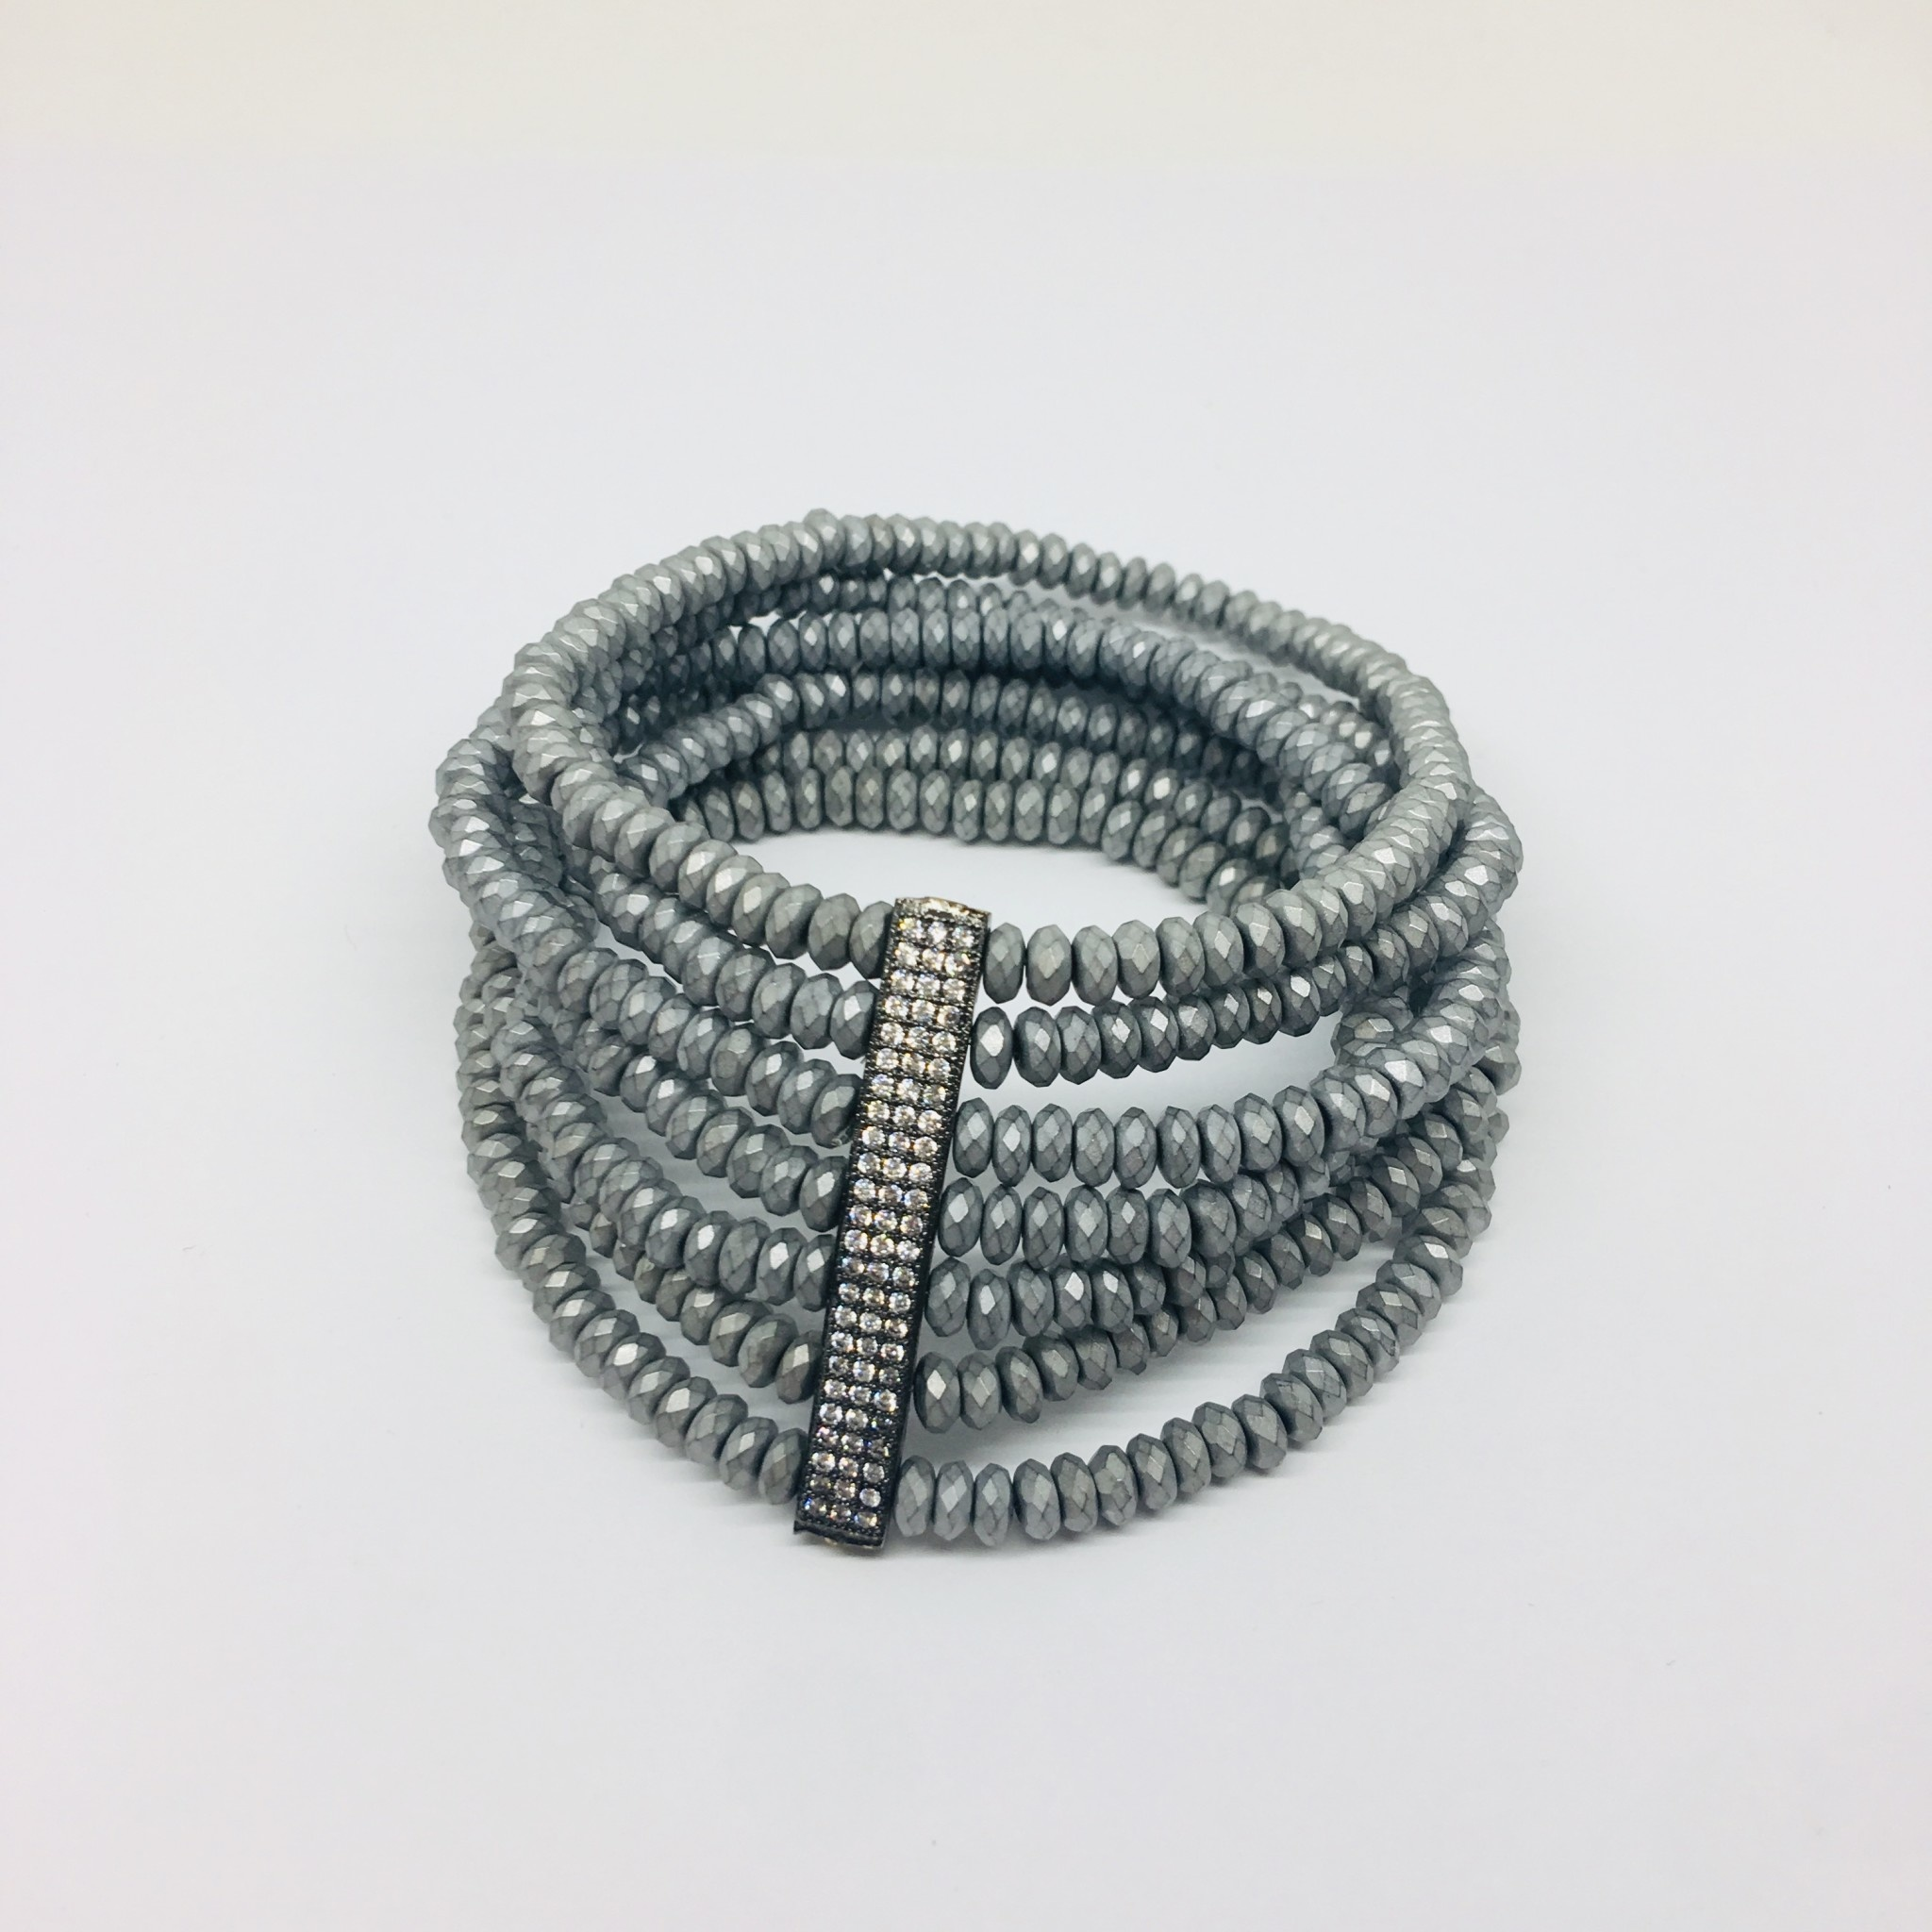 Kat Designs Hematite and Crystal Stretch Bracelet